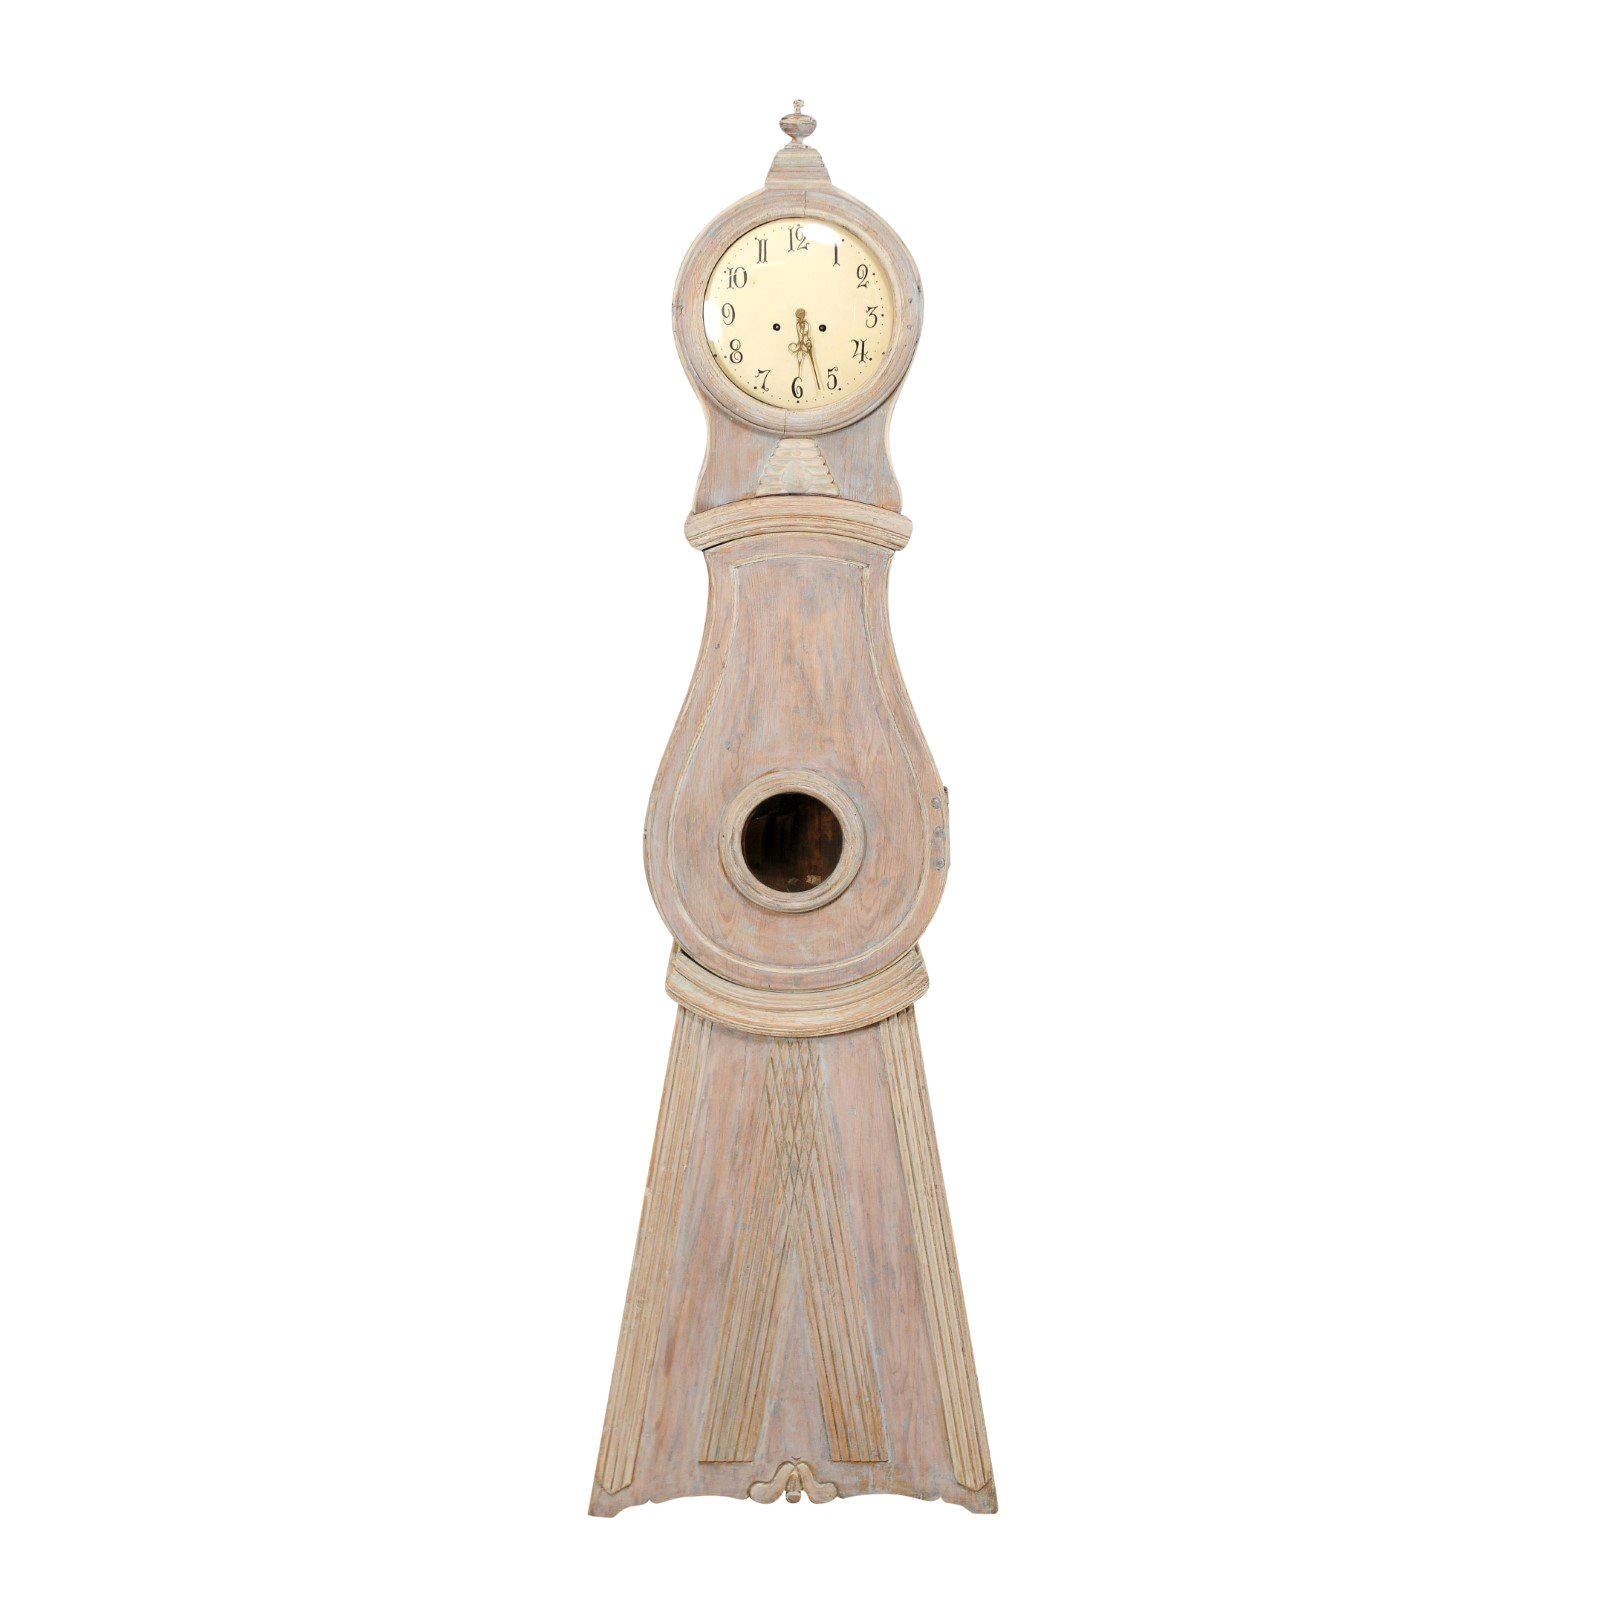 Swedish 19th Century Floor Clock with Round Finial Crest